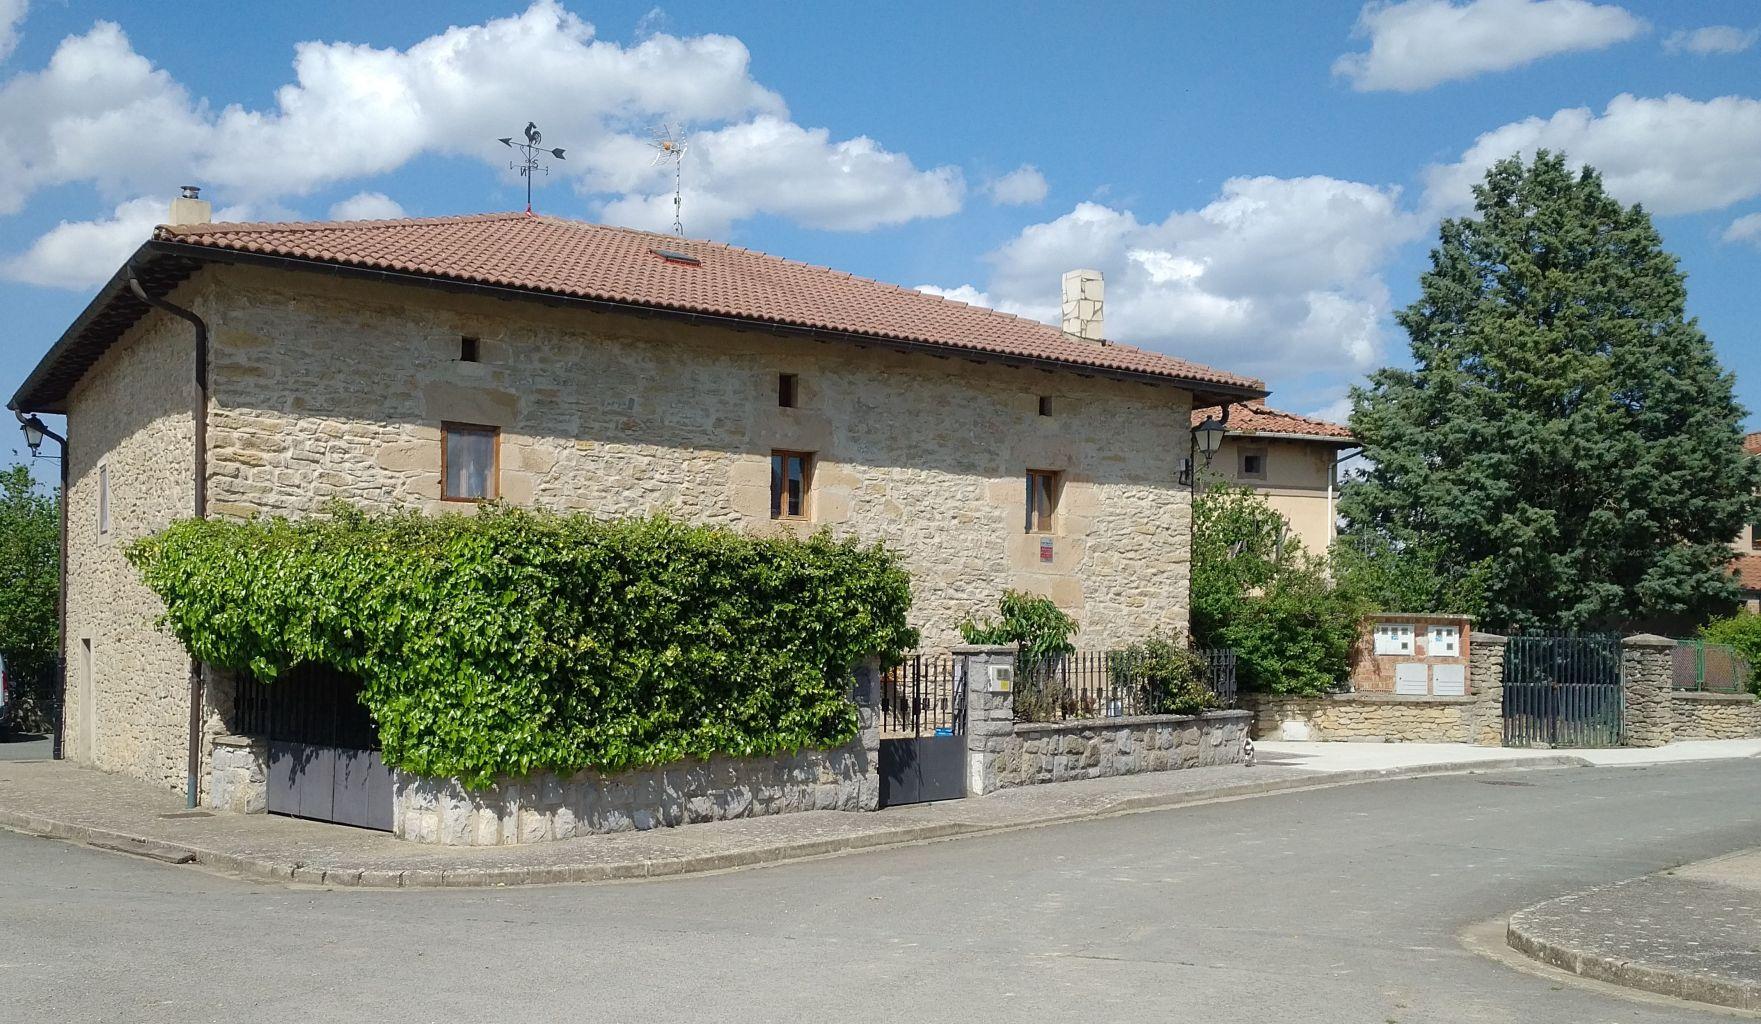 A 10kms de Vitoria,casa solariega del siglo XVIII, rehabilitada totalmente,229m2 utiles,entorno idilico!! Te sorprendera!!